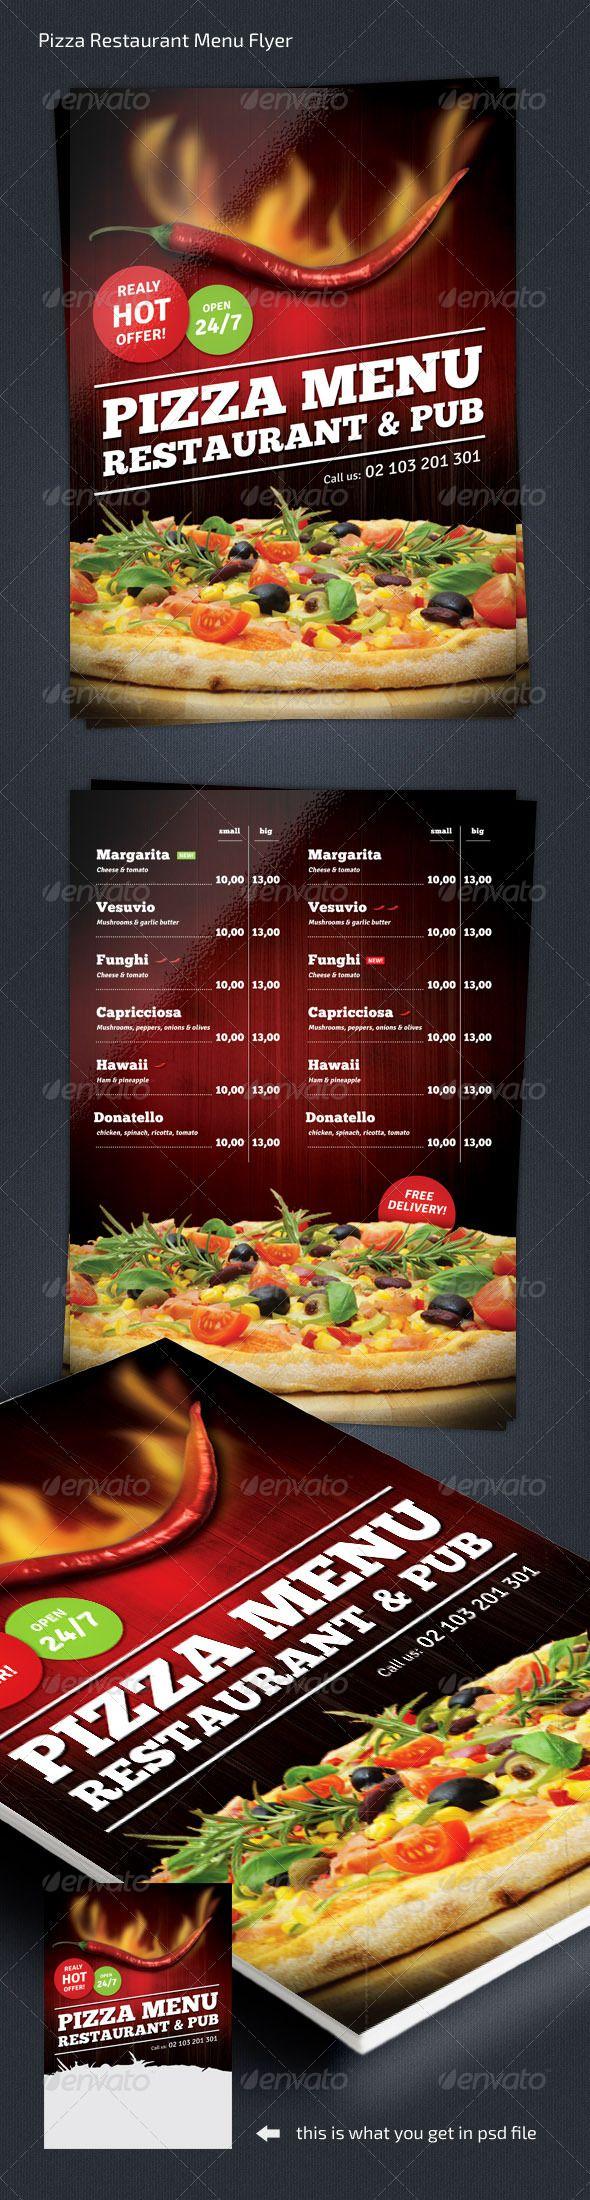 Pizza Restaurant Menu Flyer Template #design Download: http://graphicriver.net/item/pizza-restaurant-menu-flyer-a4/7930122?ref=ksioks